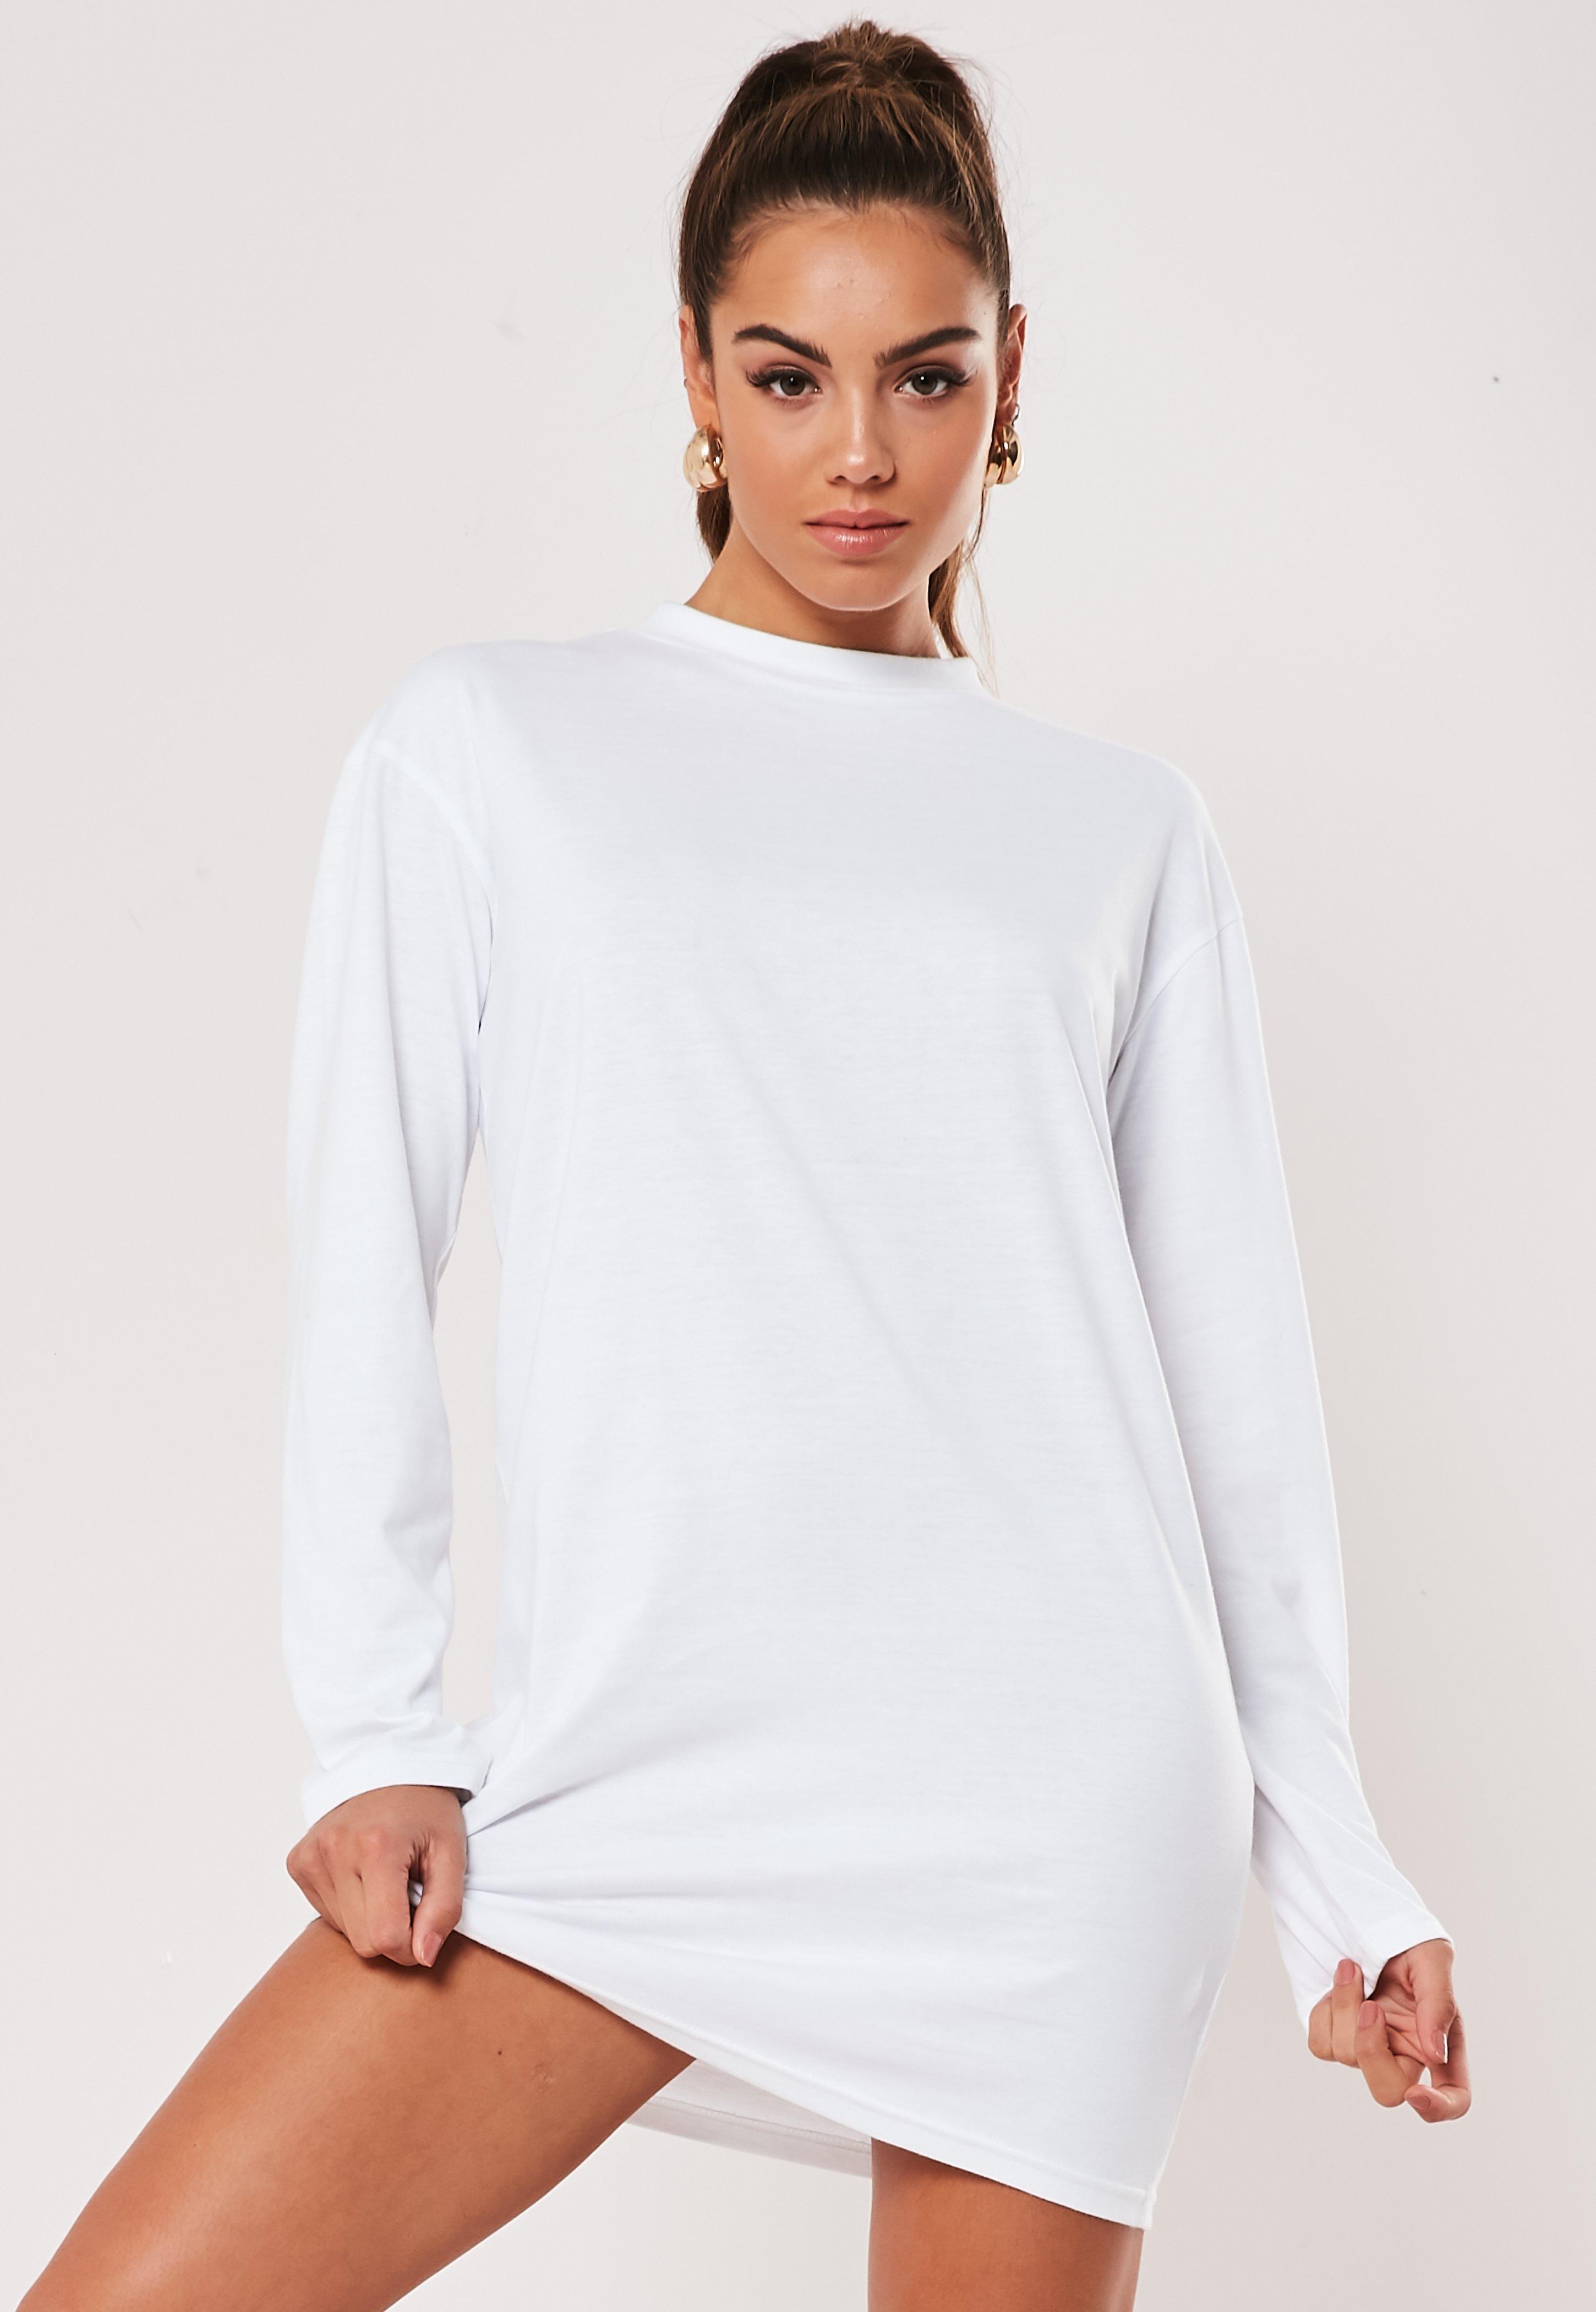 c36babe63da7 Robe manches longues pour femme - Missguided